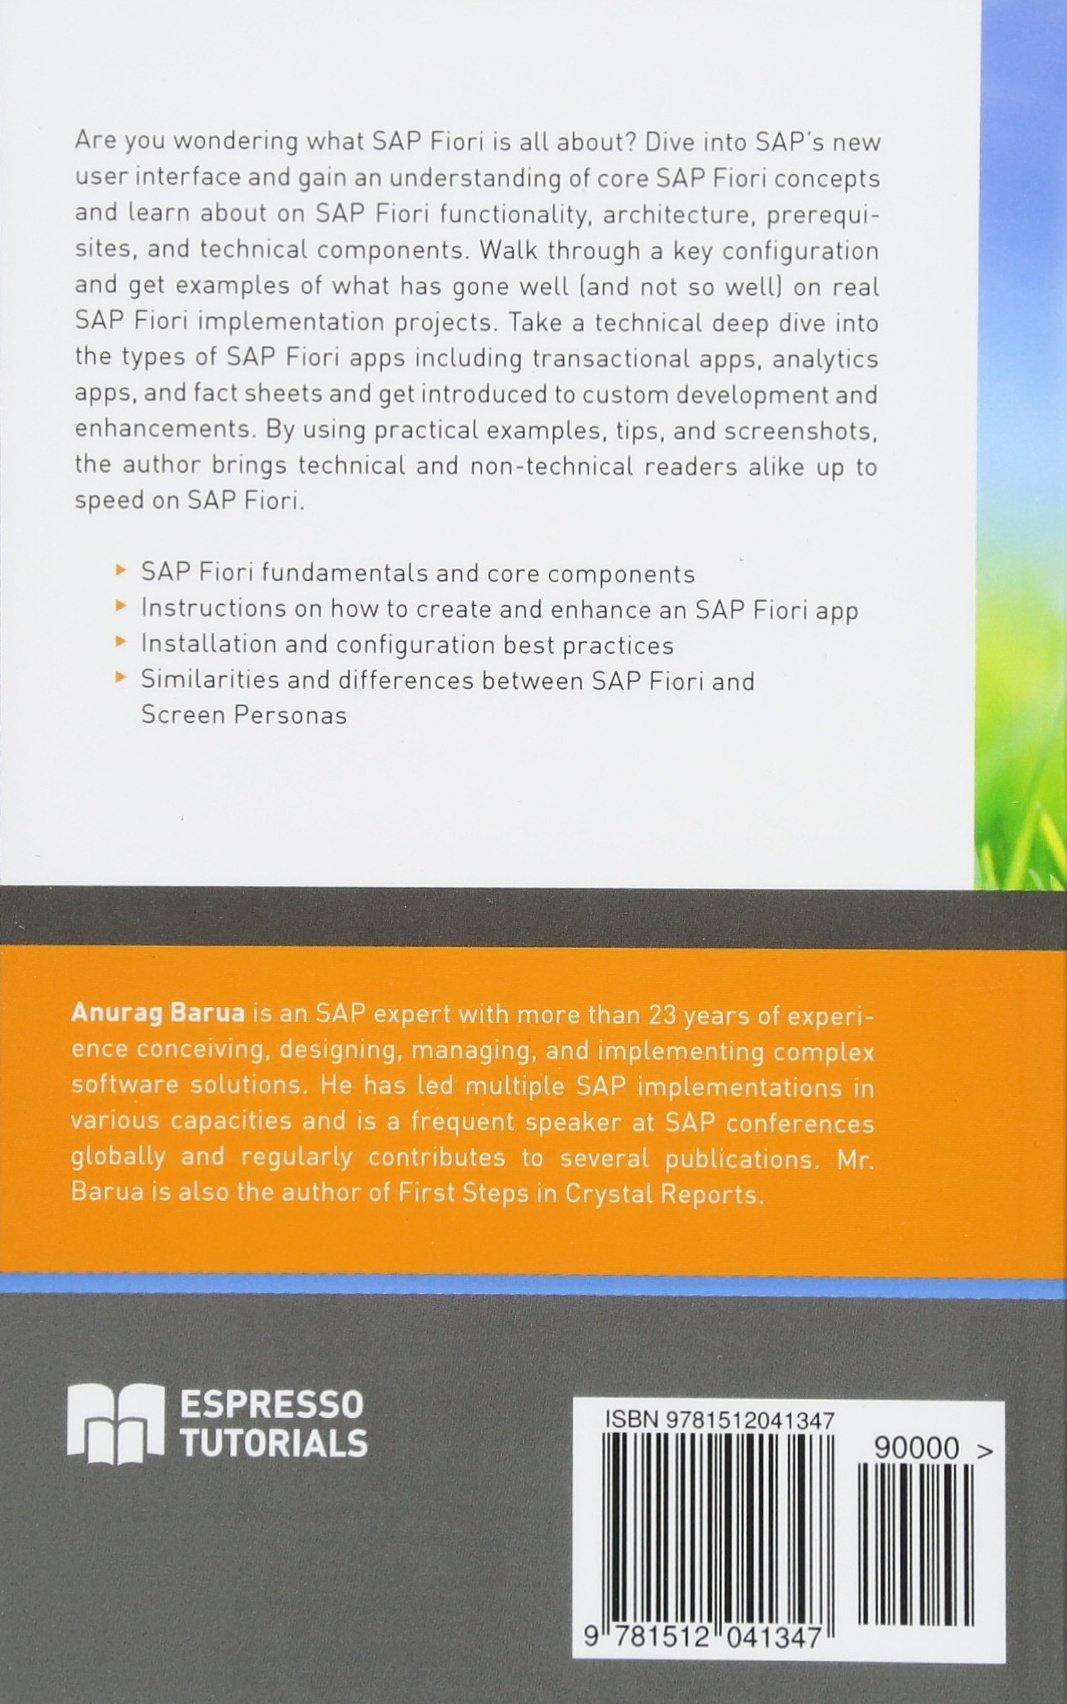 Amazon com: First Steps in SAP Fiori (9781512041347): Anurag Barua